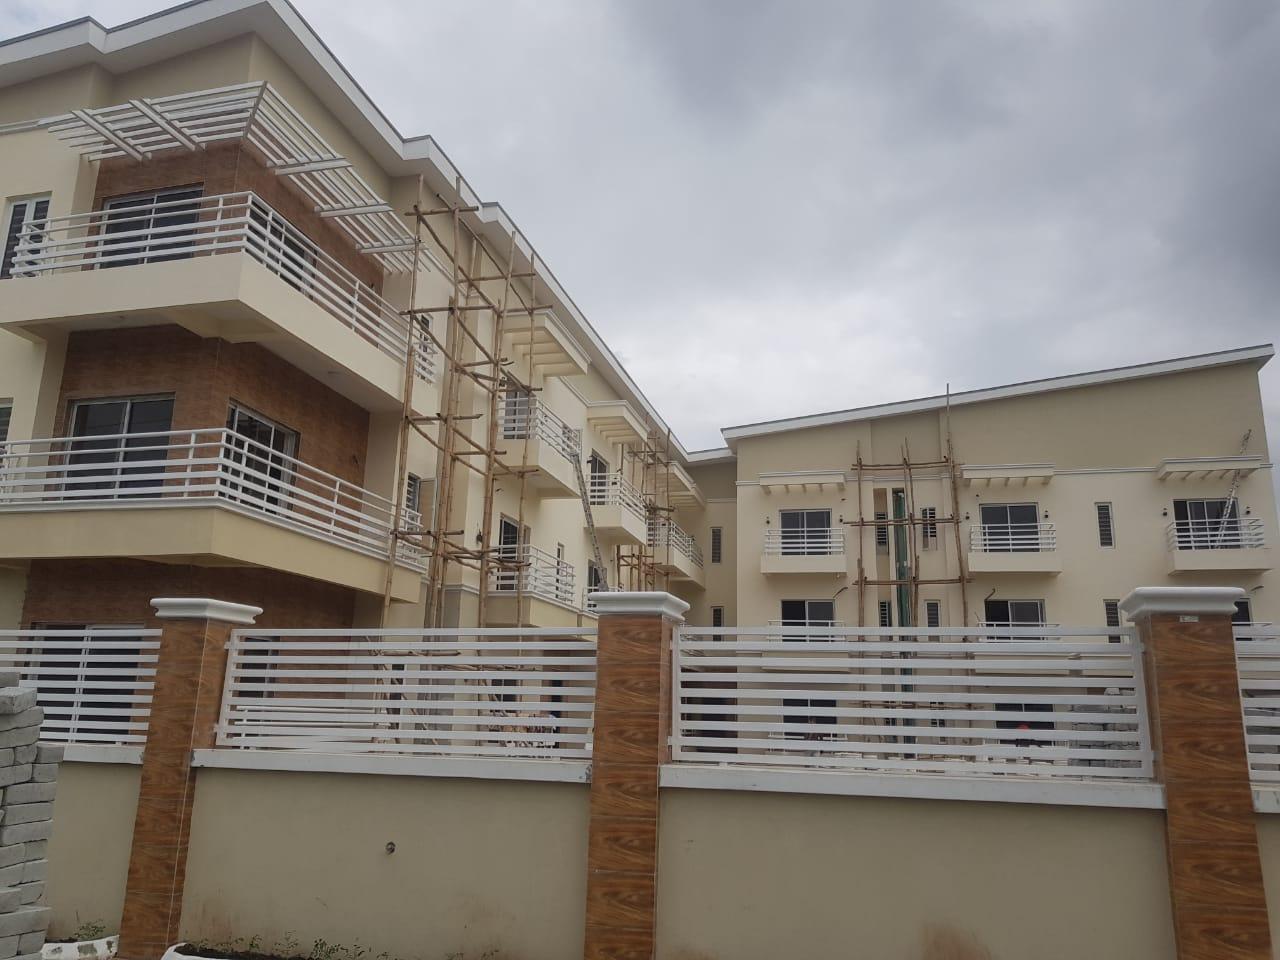 2 bedroom flat for sale in lekki lagos-nigeria property finder-kaan properties limited